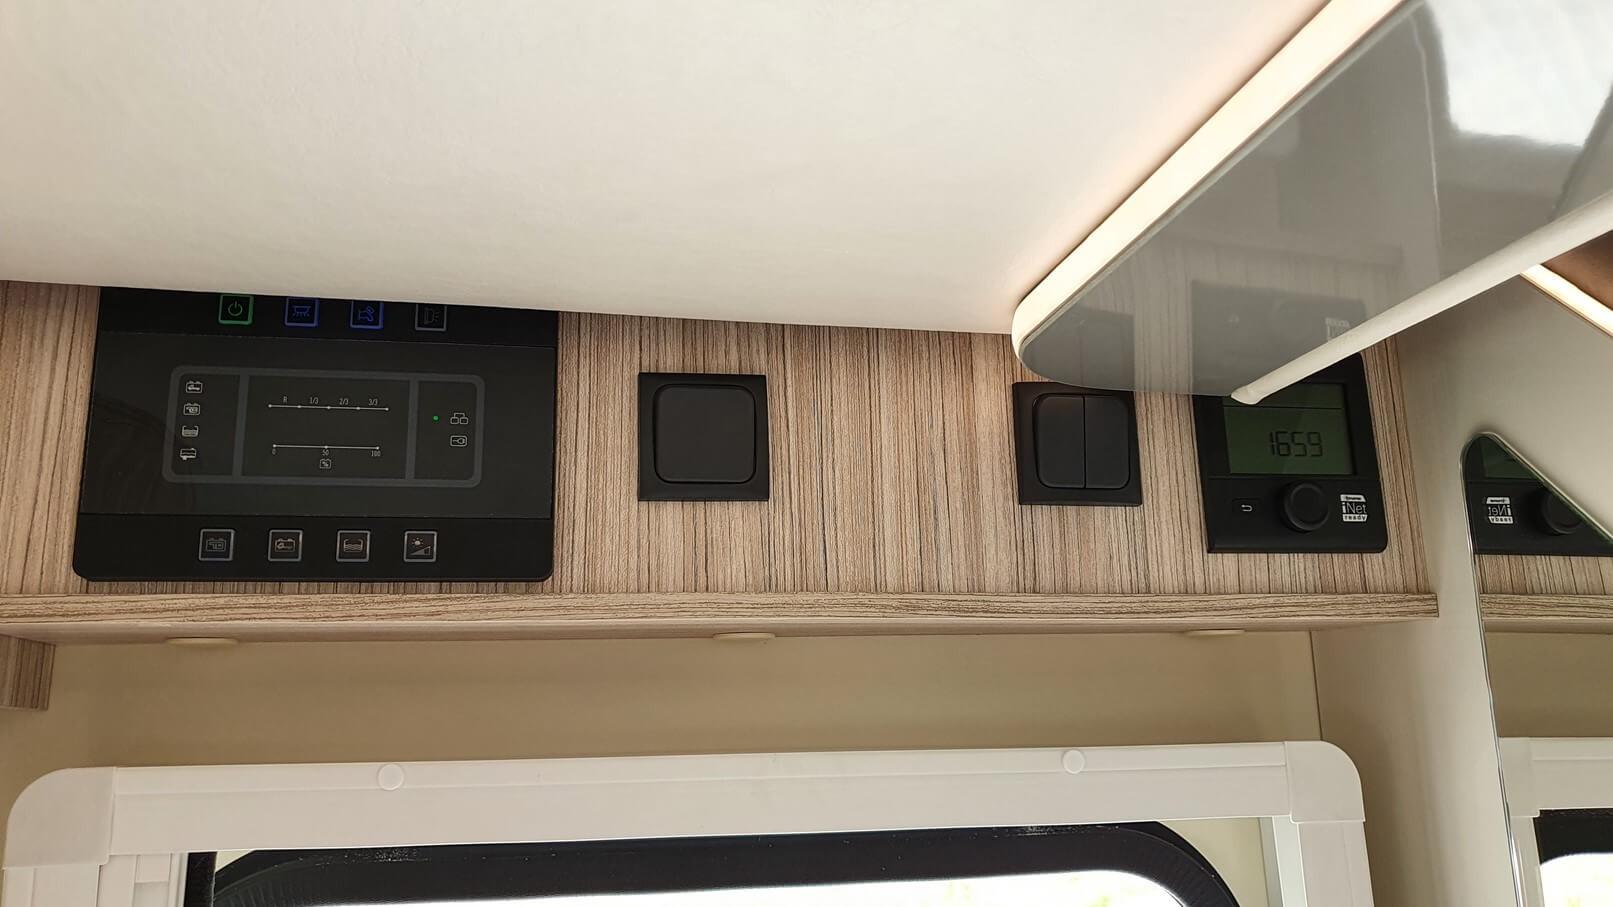 Autocaravana con tablero electronico